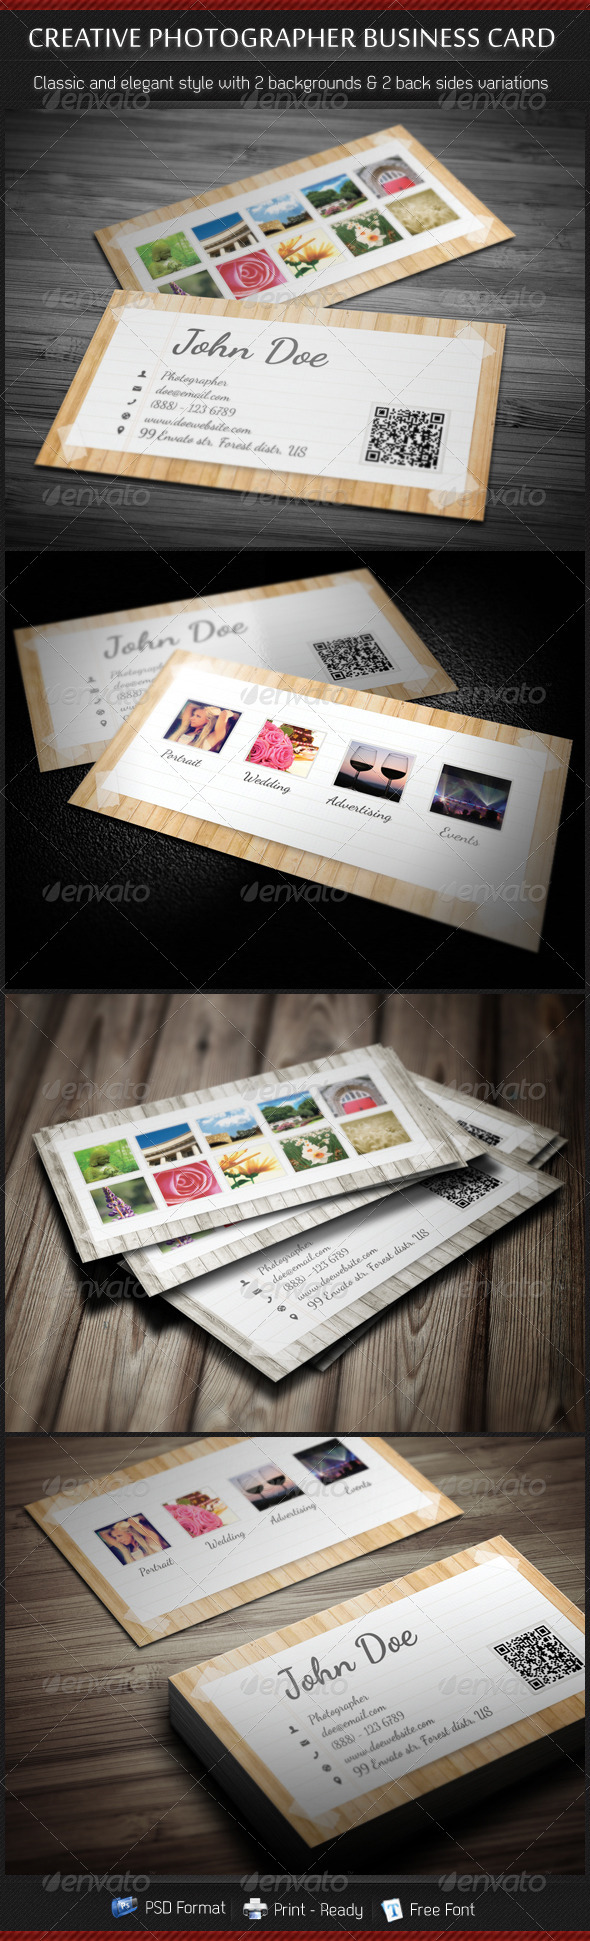 GraphicRiver Creative Photographer Business Card 3558058